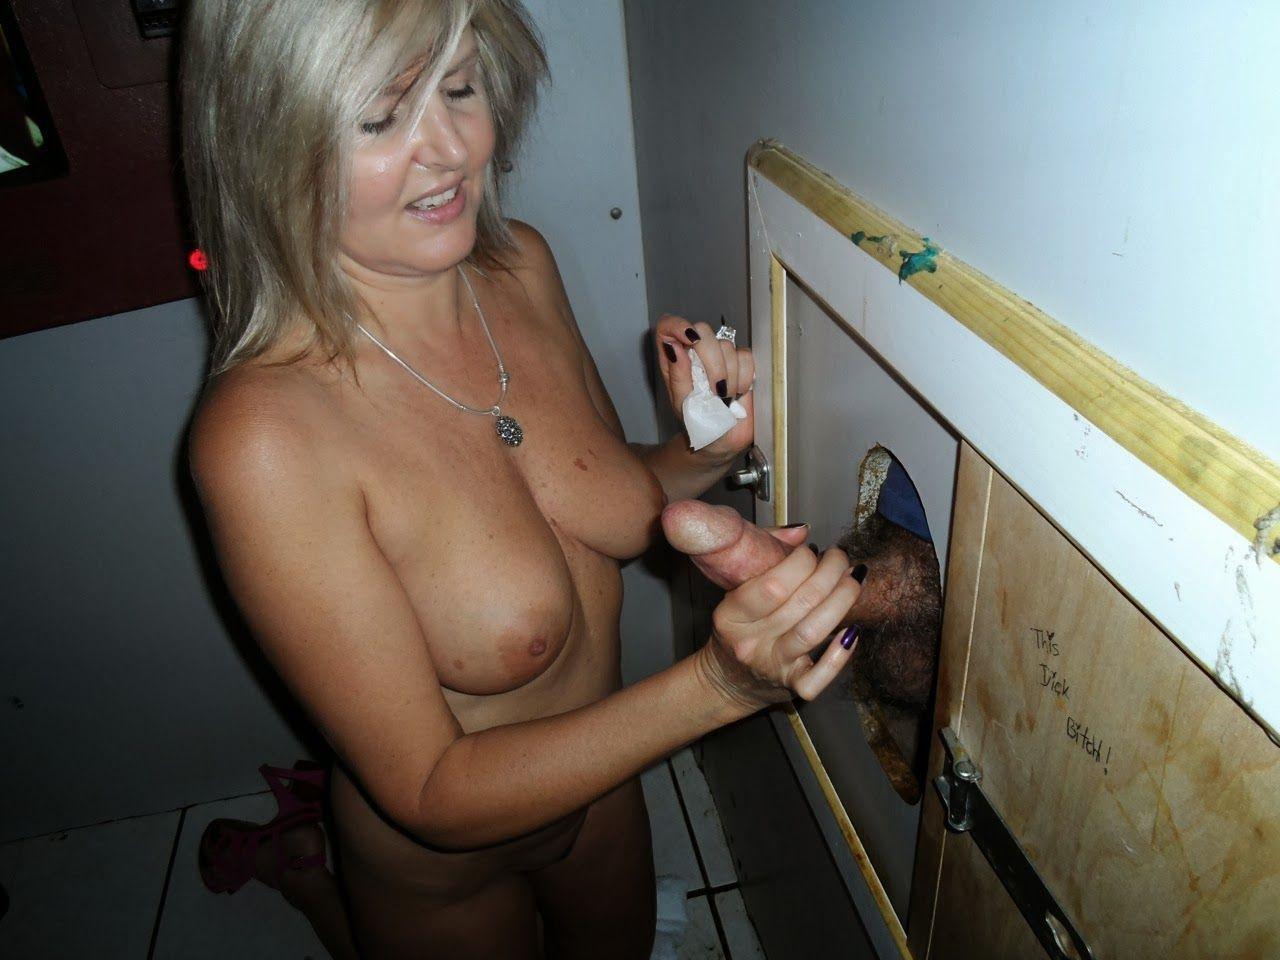 Kendra wilikson nude pics